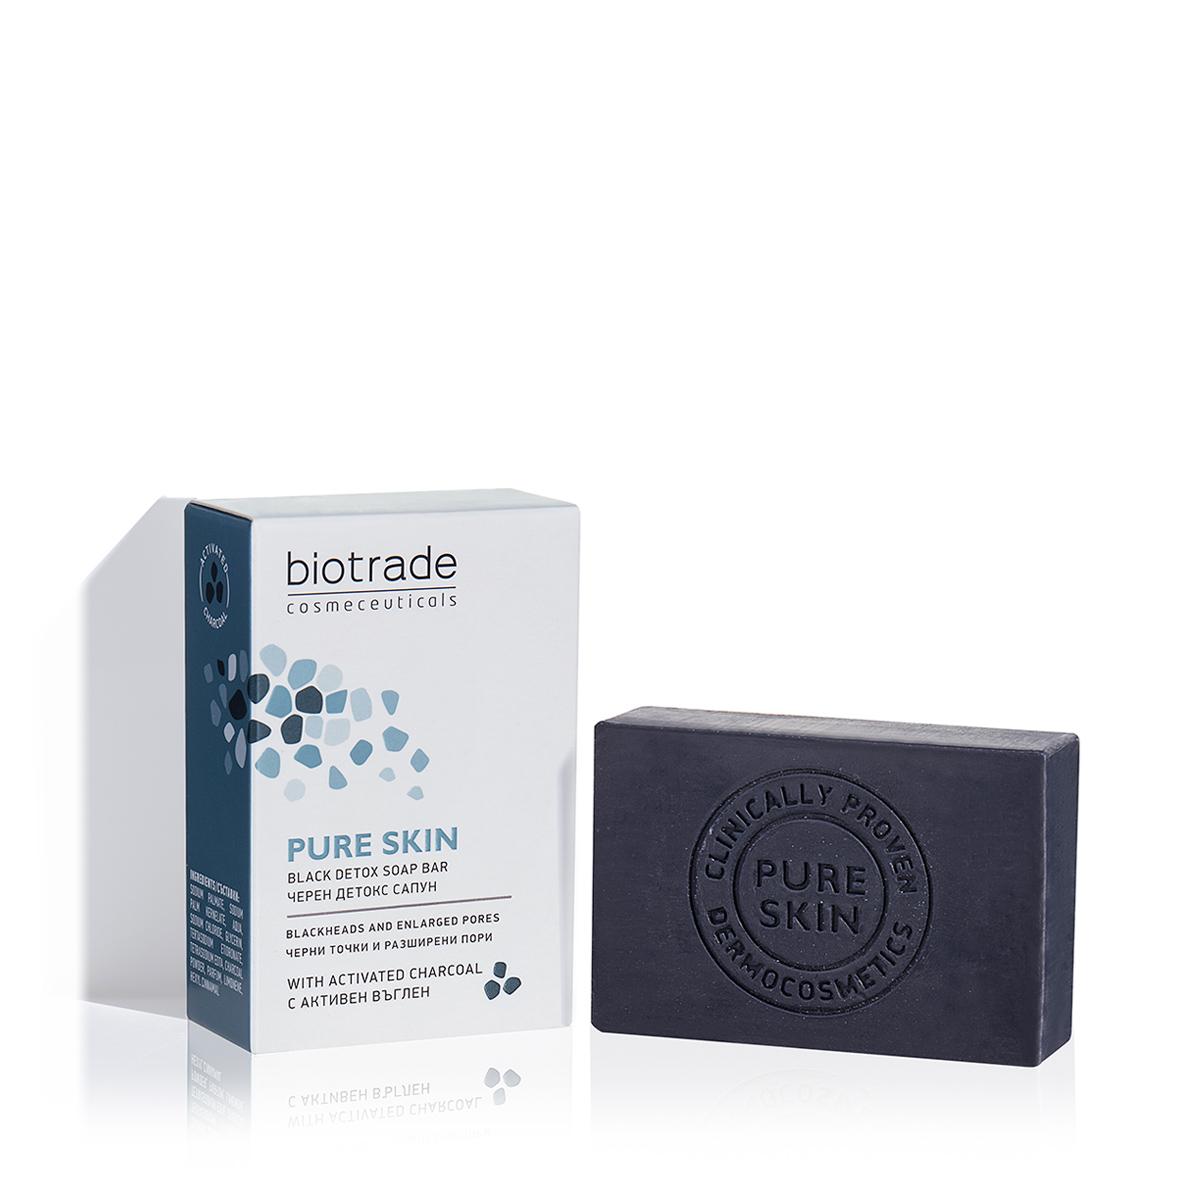 Biotrade Product